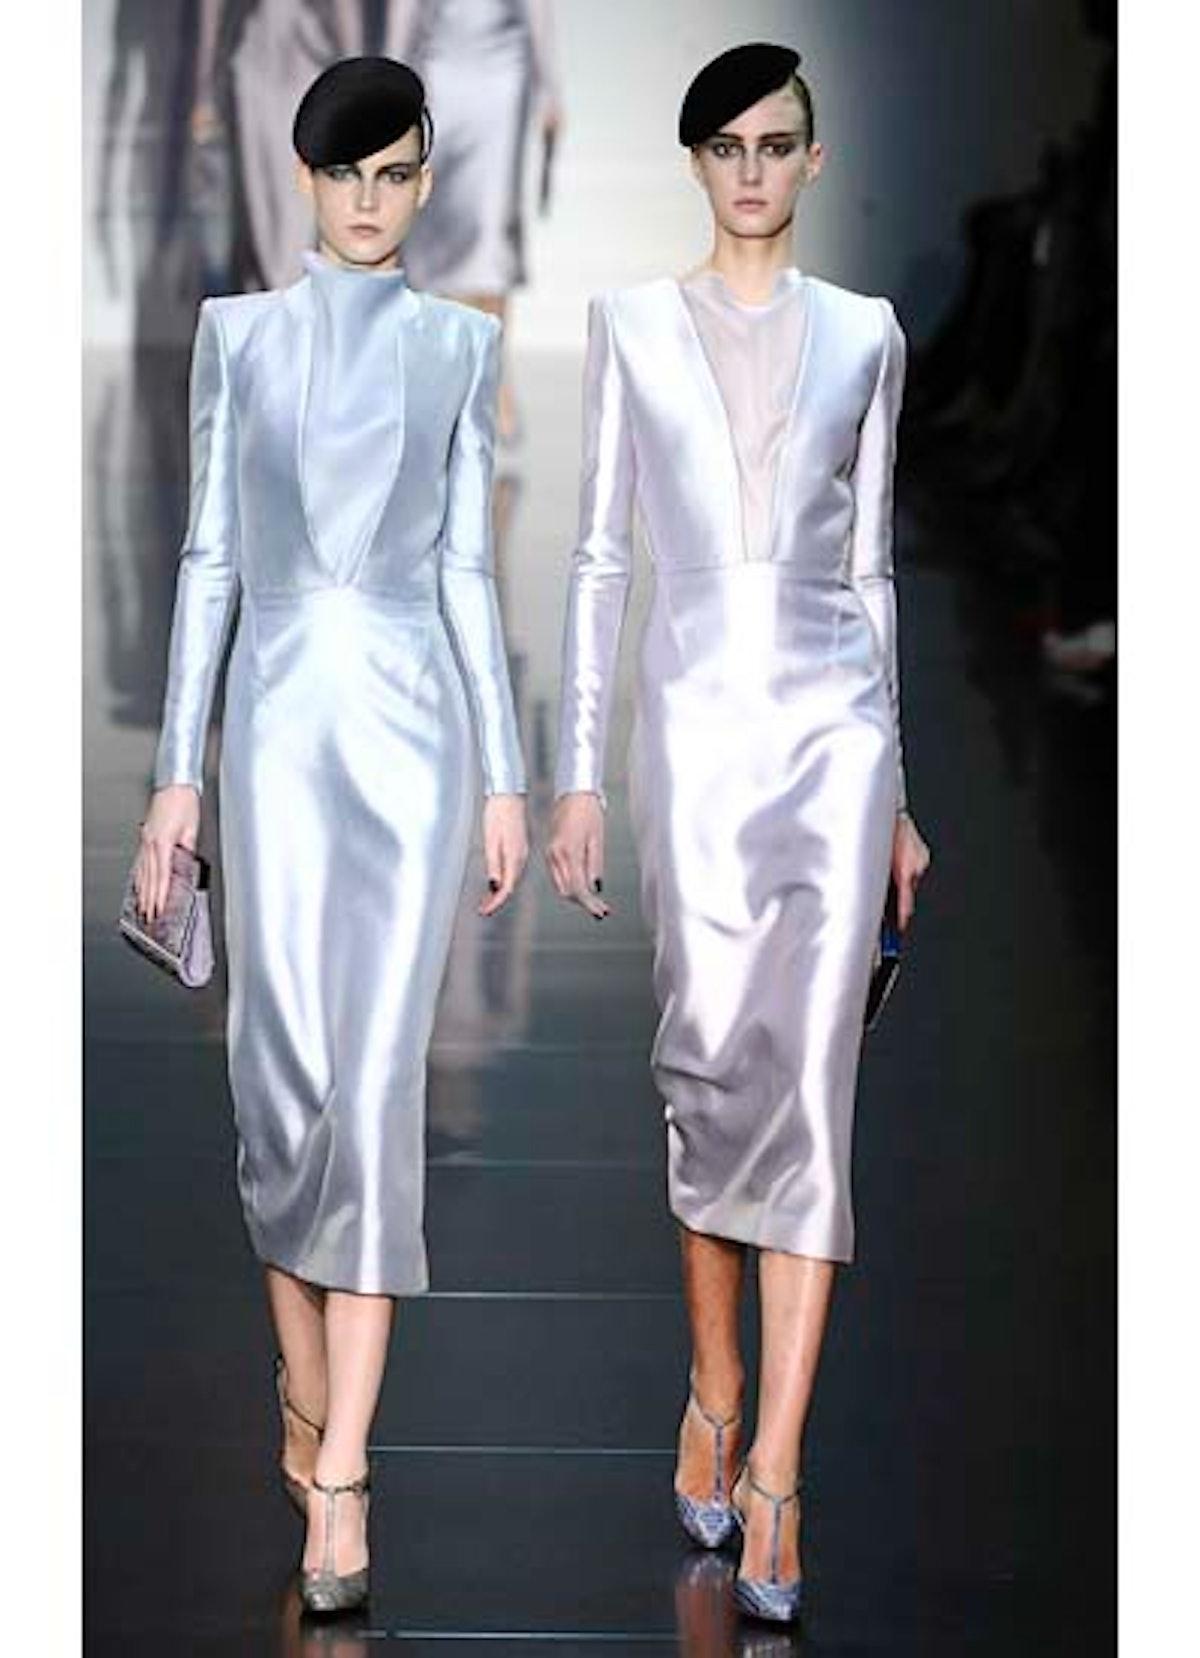 fass-giorgio-armani-couture-2012-runway-14-v.jpg